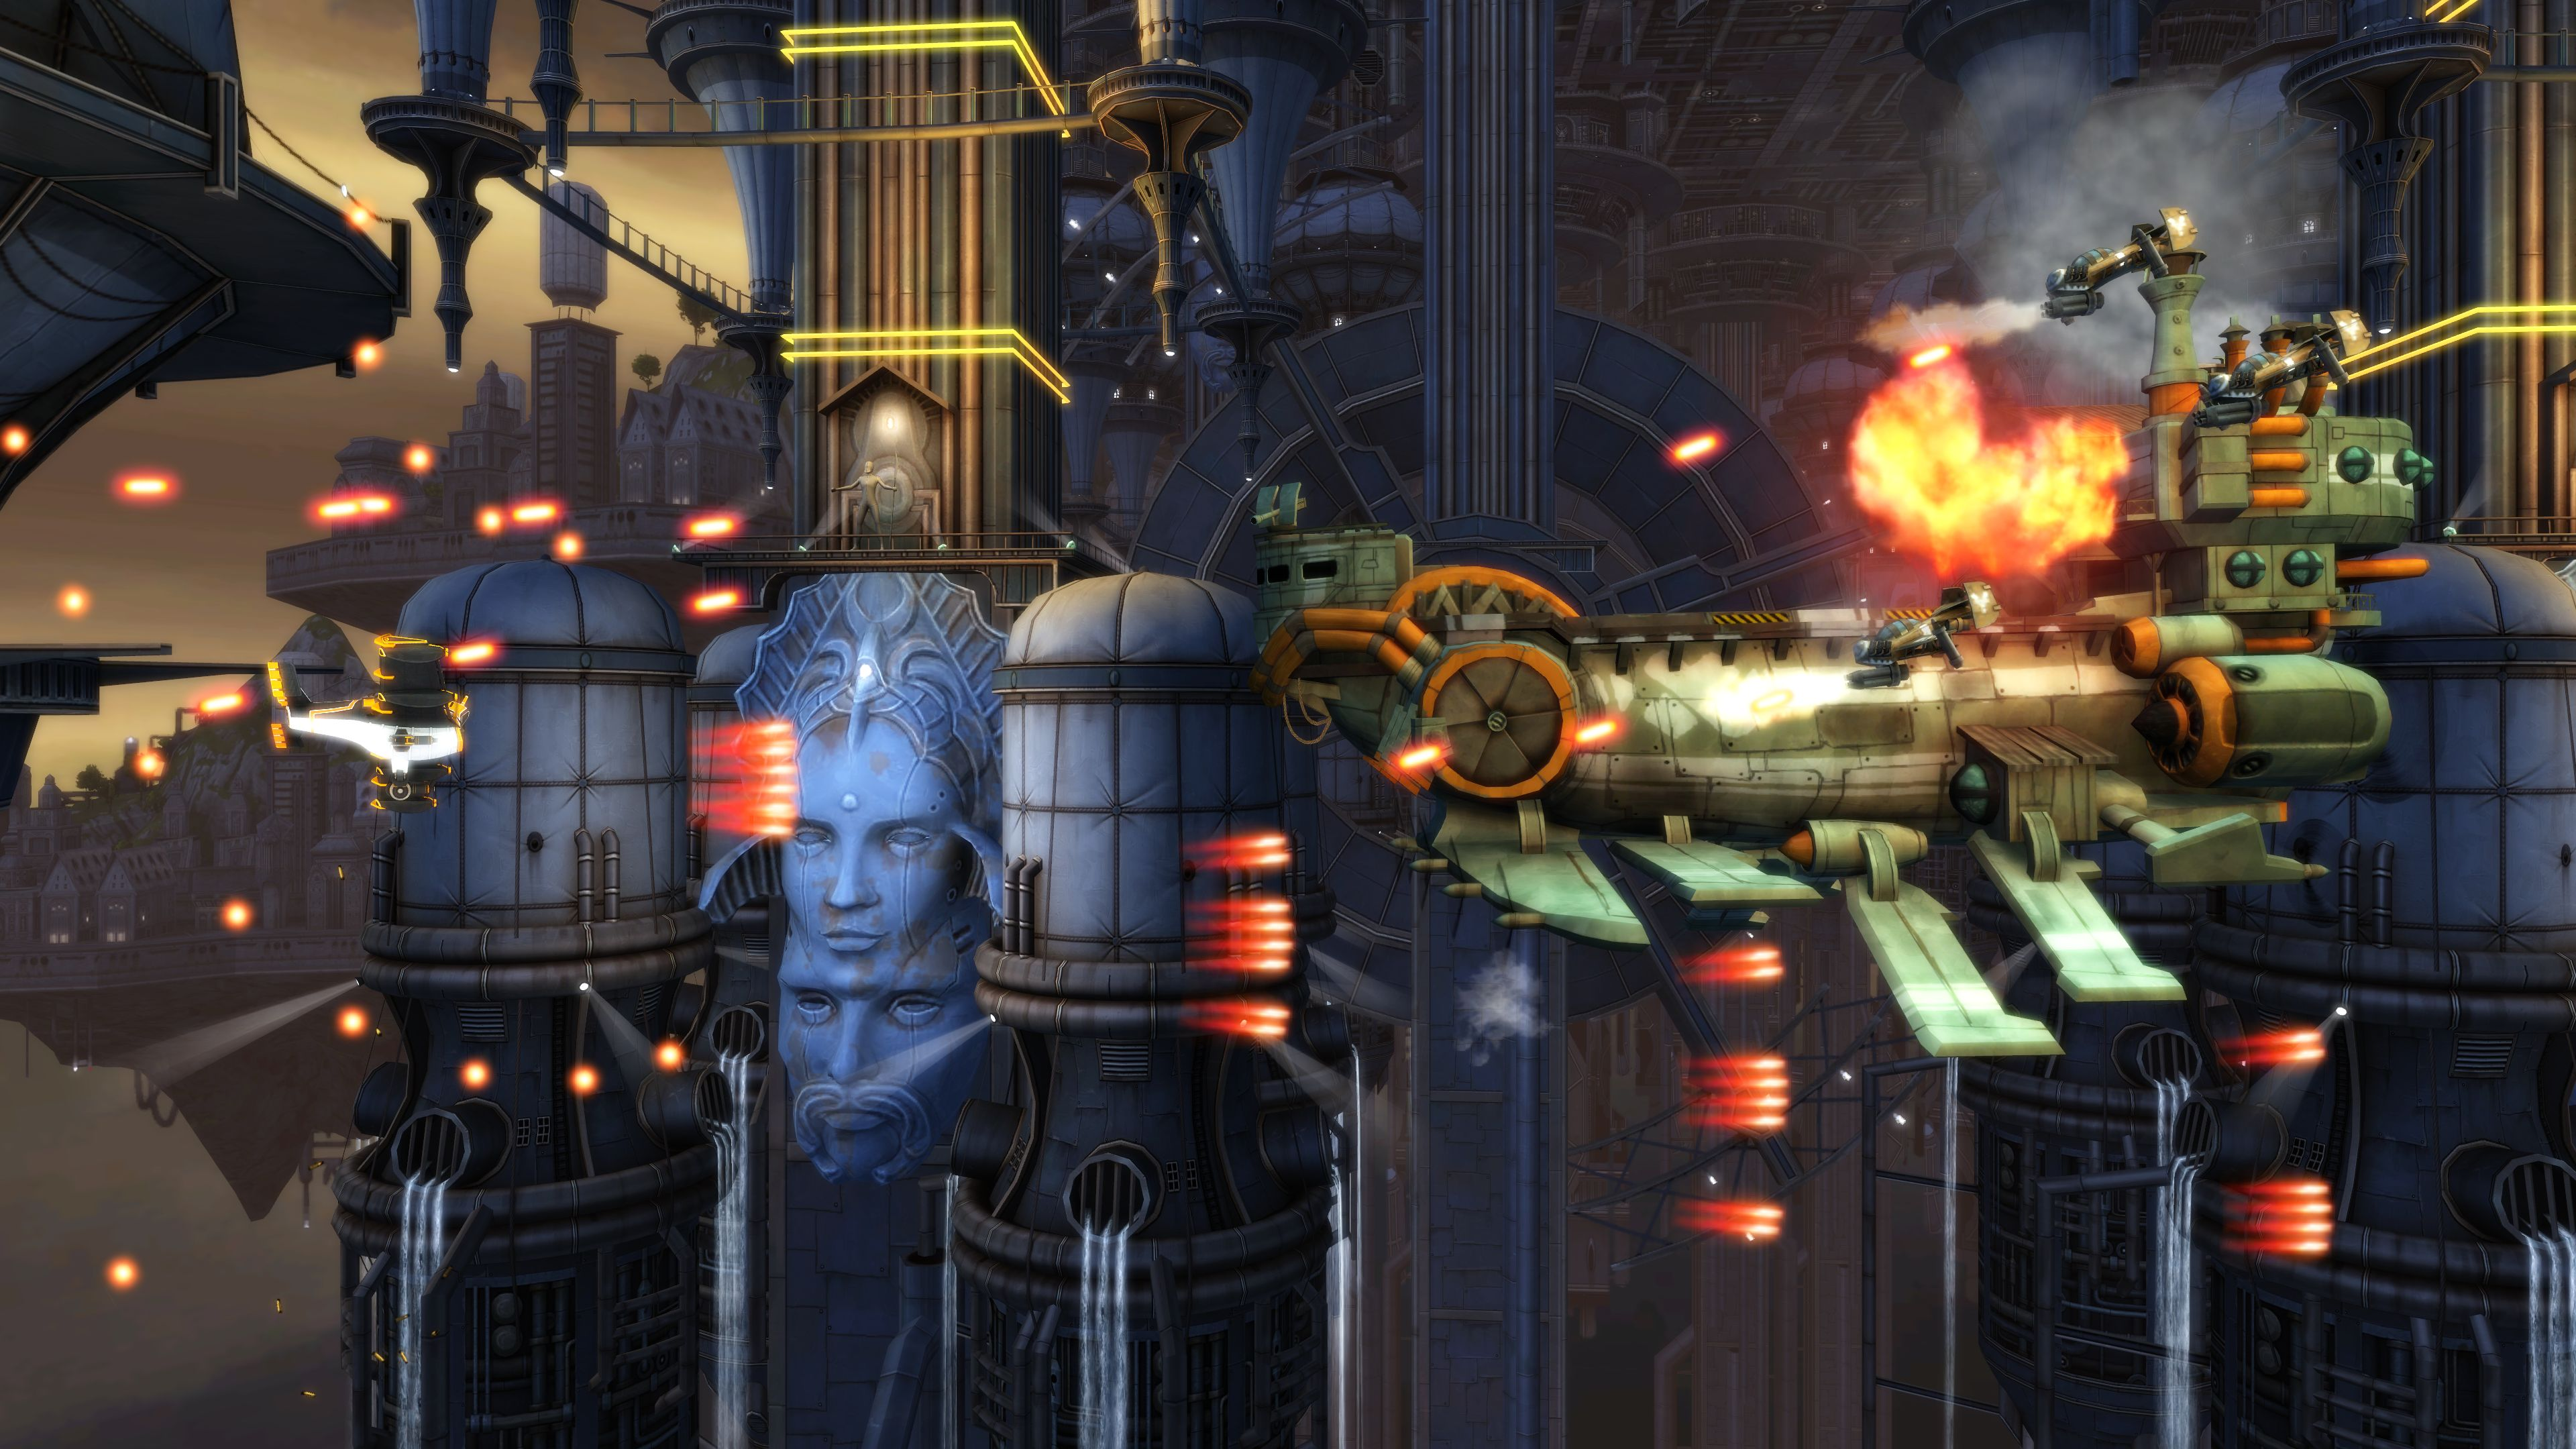 Hry pro Switch se rozrostou o Battle Chasers: Nightwar a Sine Mora EX 142176